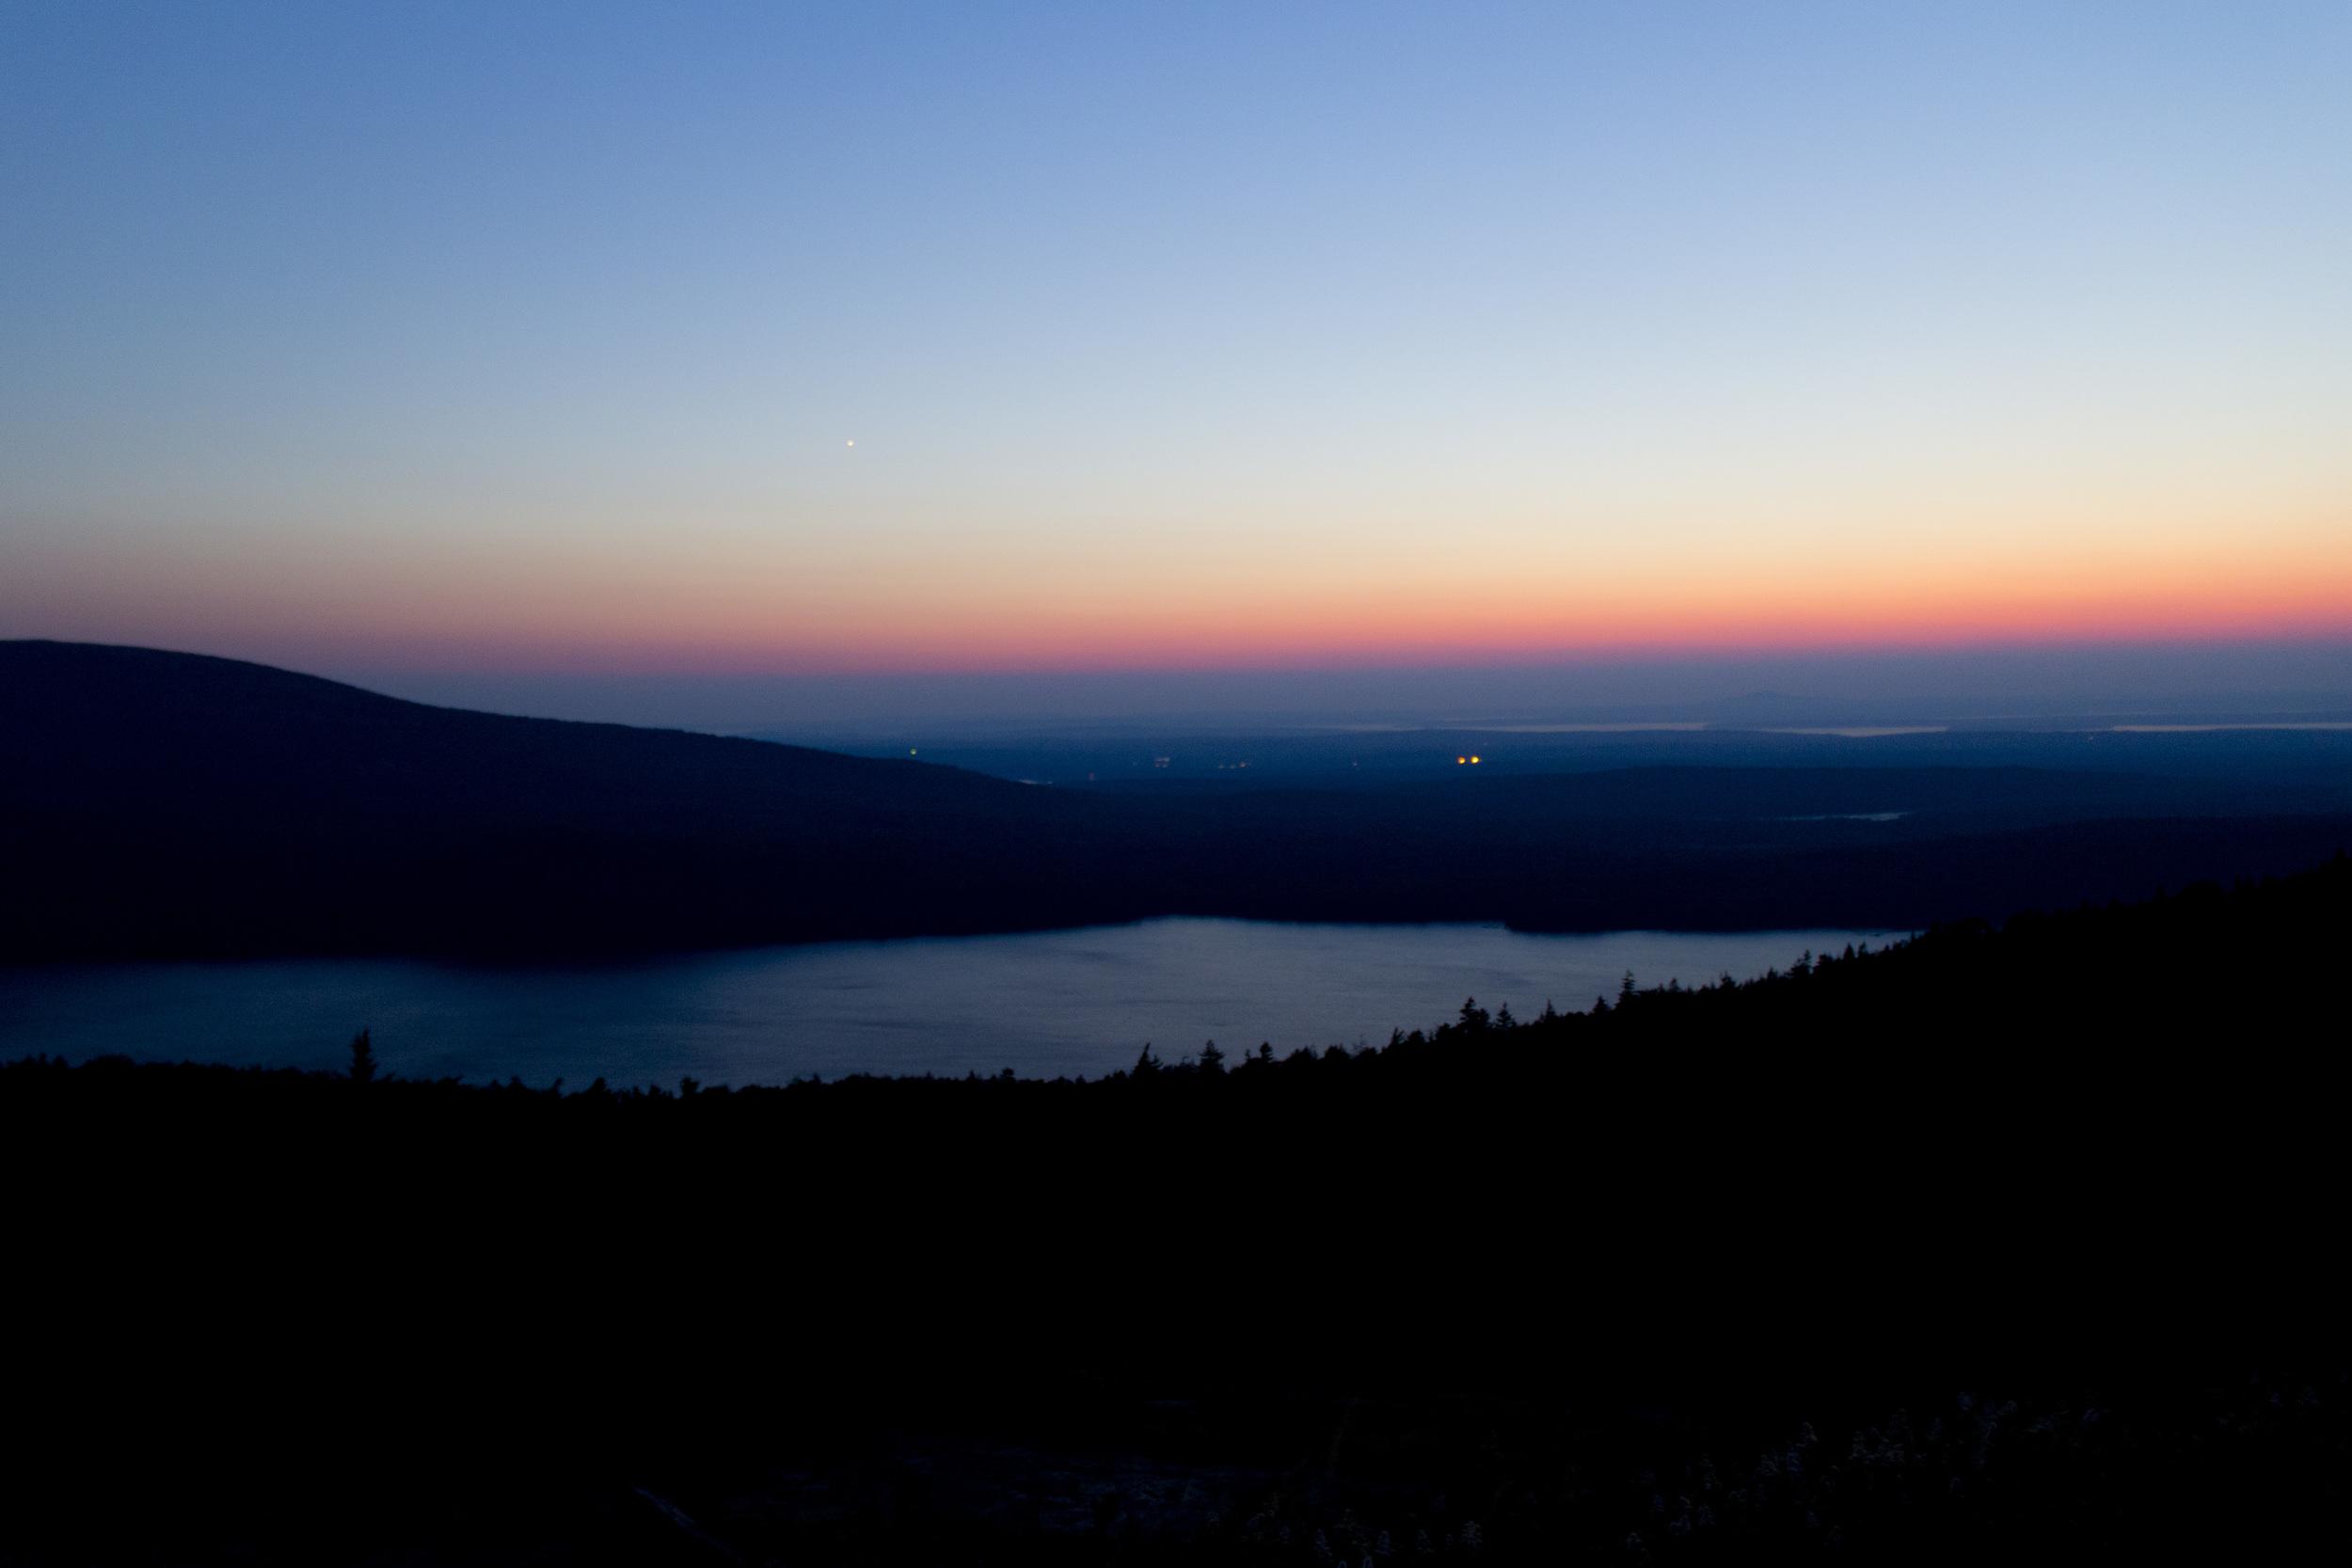 Sunset at Cadillac Mountain - Acadia National Park